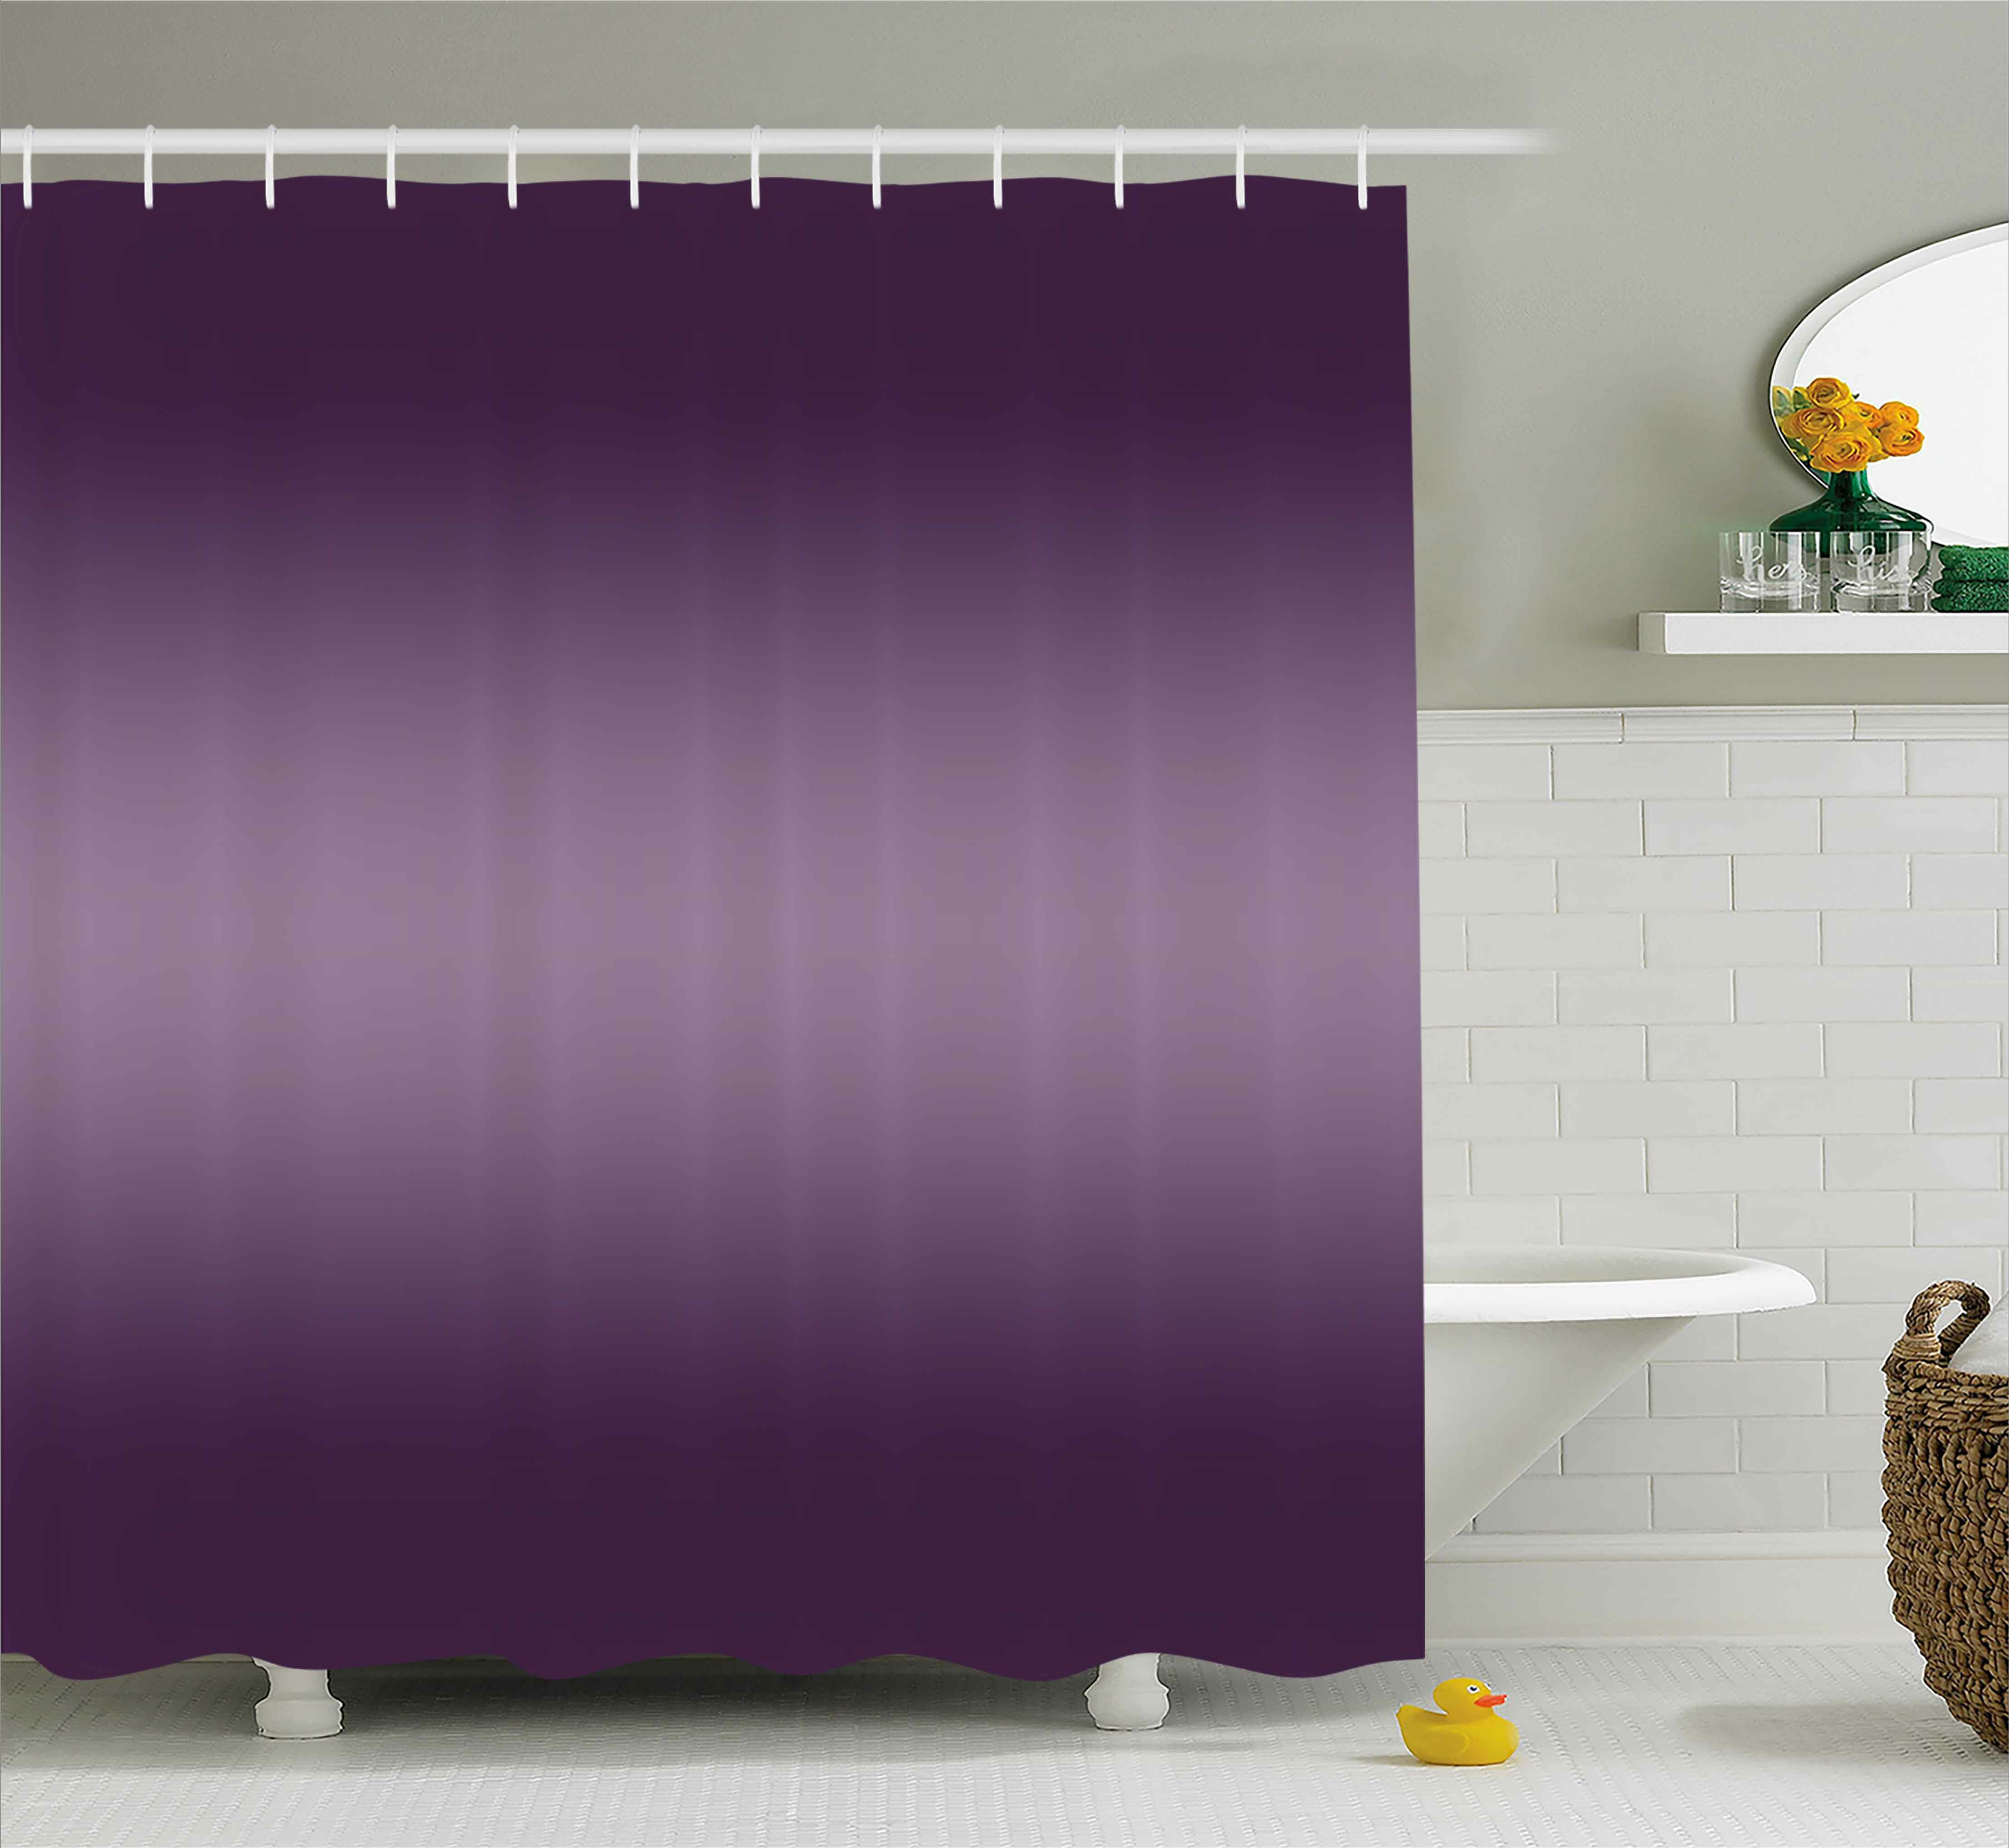 Eggplant Pattern Shower Curtain Fabric Decor Set With Hooks